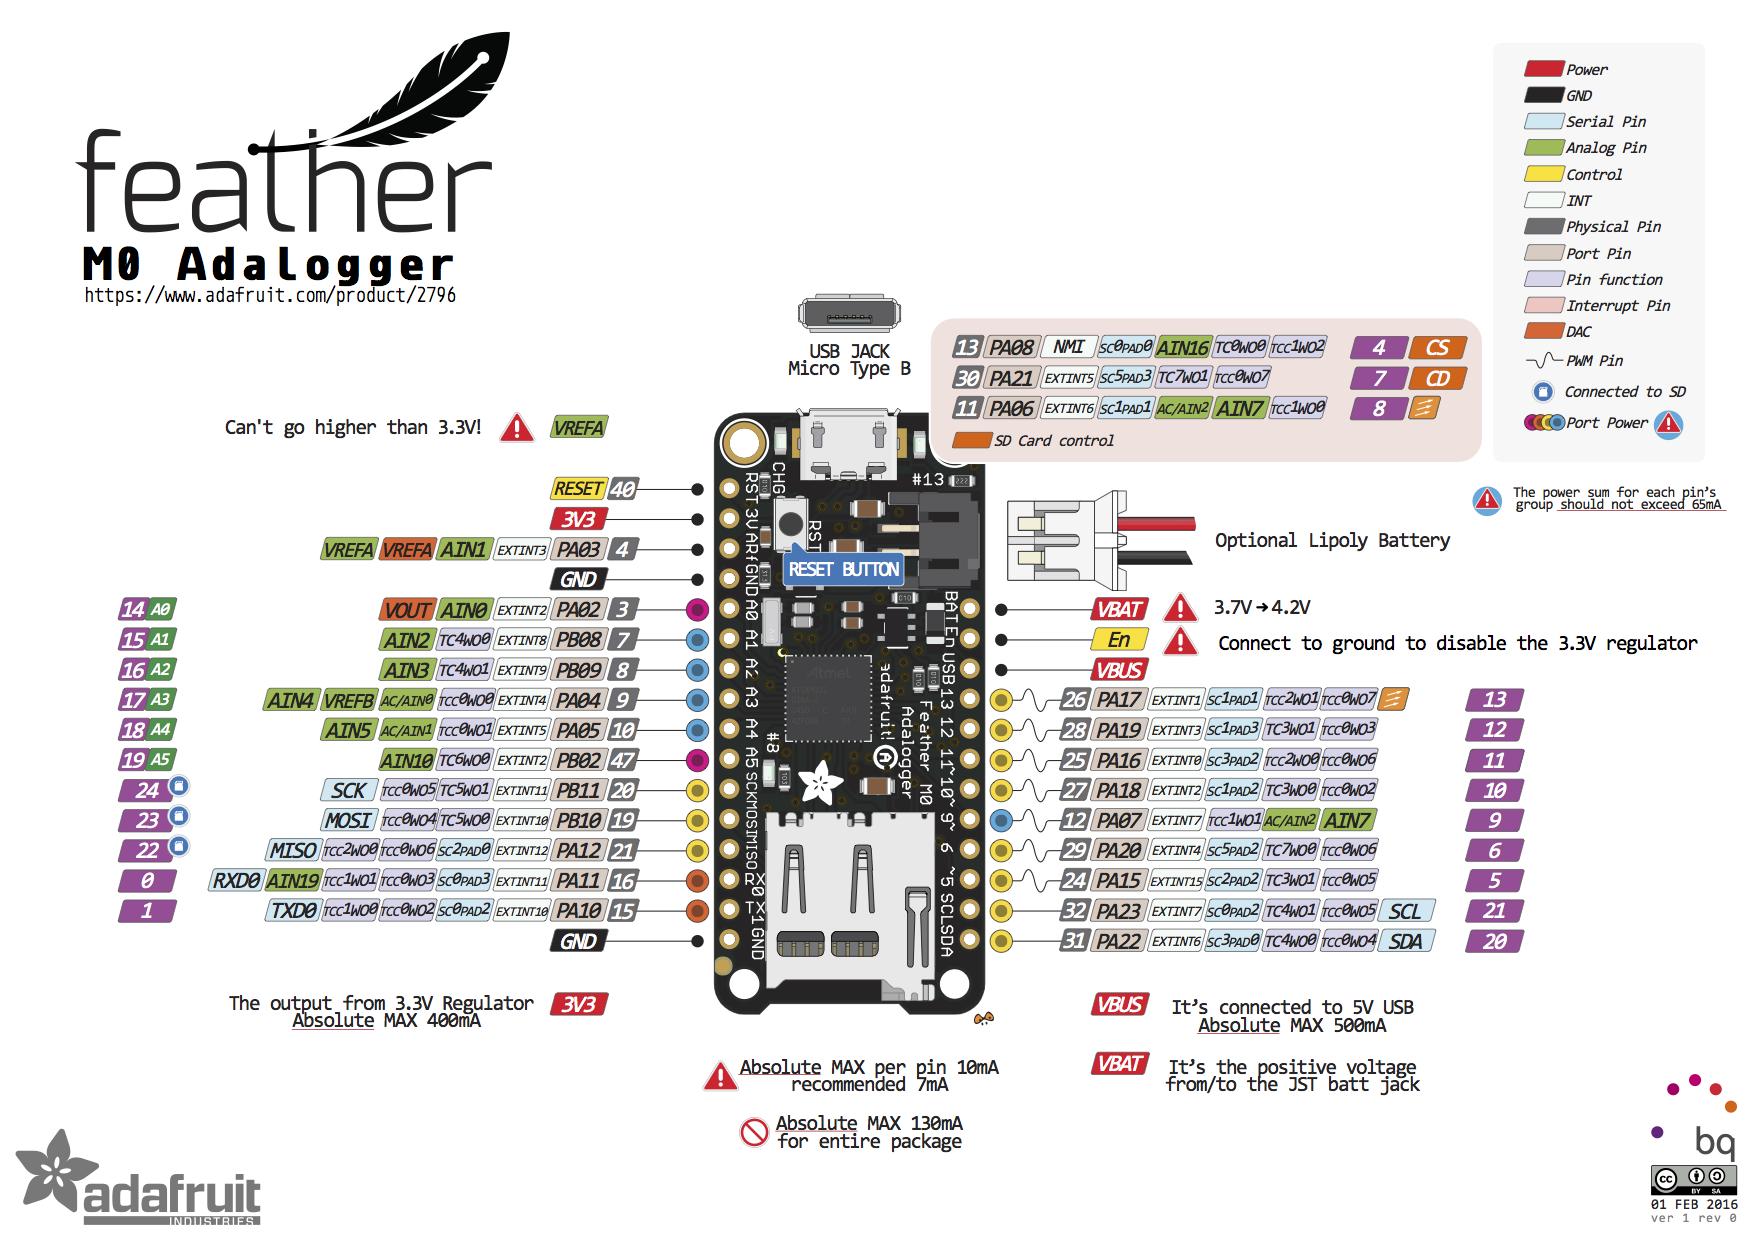 Adafruit feather m adalogger pinout tecnologia pinterest